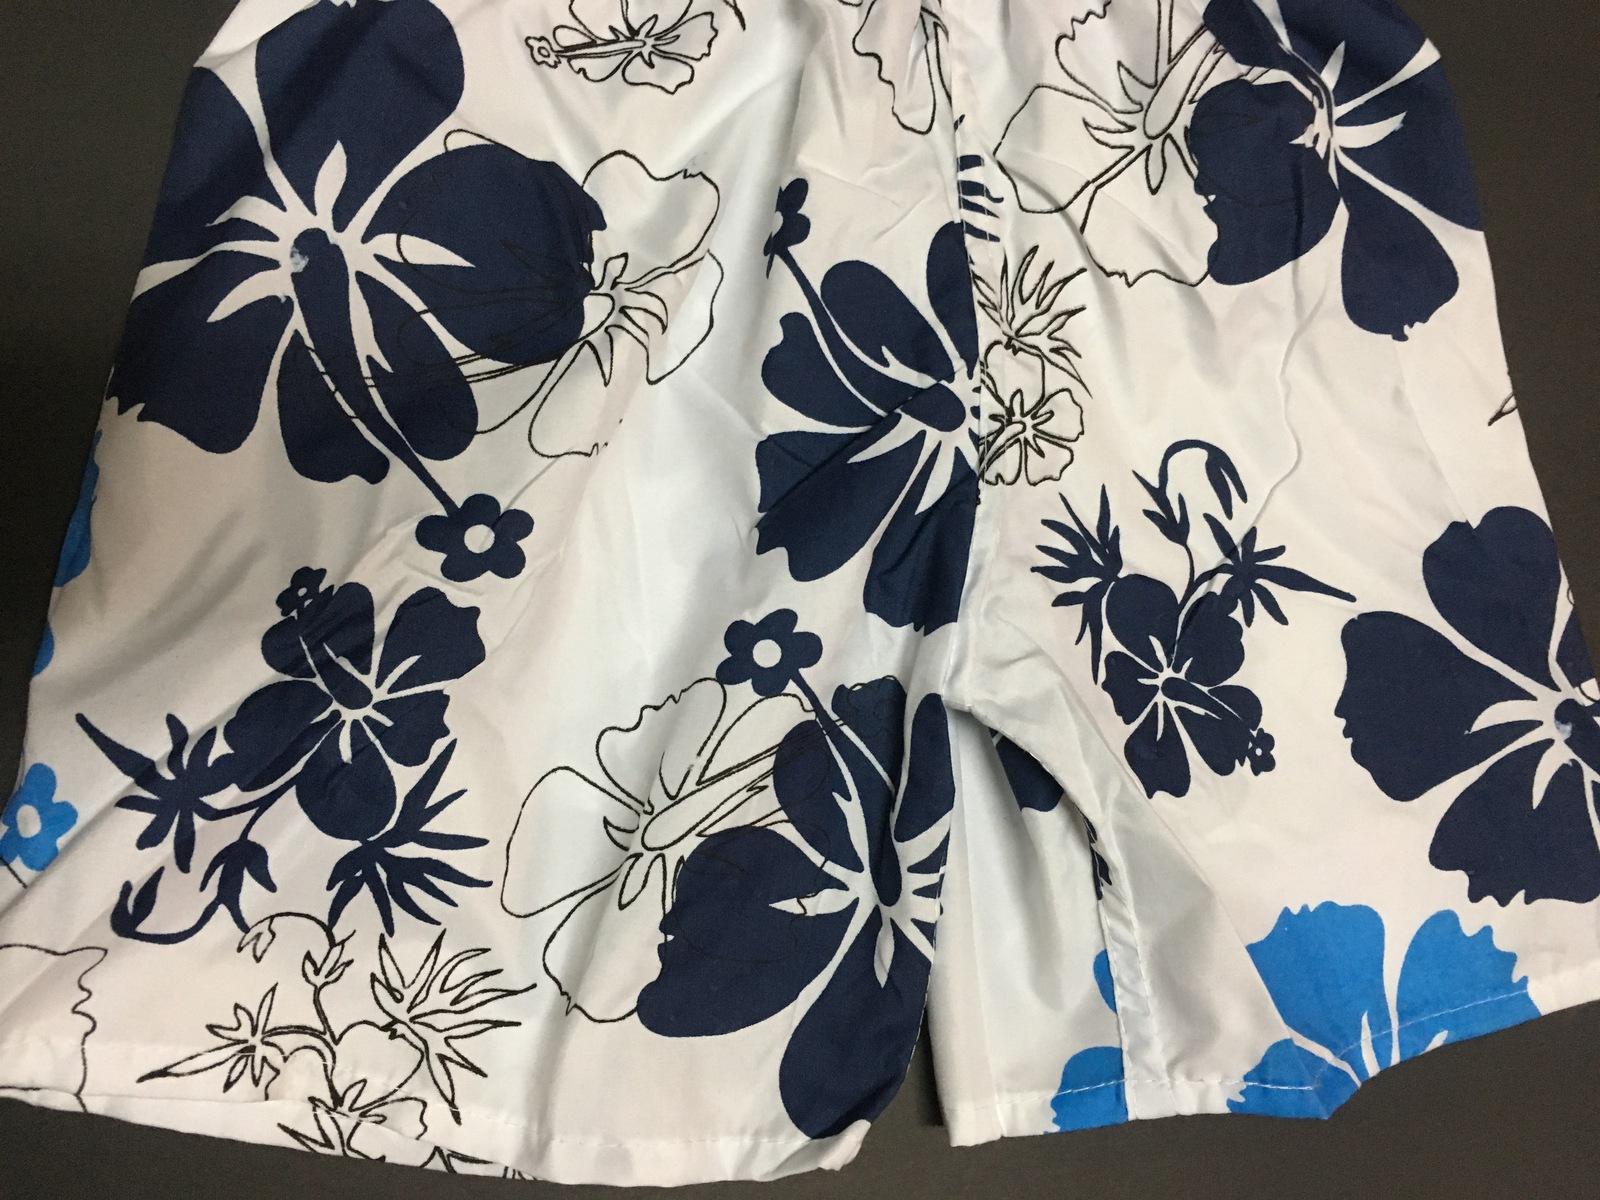 "Boy's Swim Shorts Trunks Blue & White Floral 10.2"" x 14.2"" SZ 3/4 Toddler"